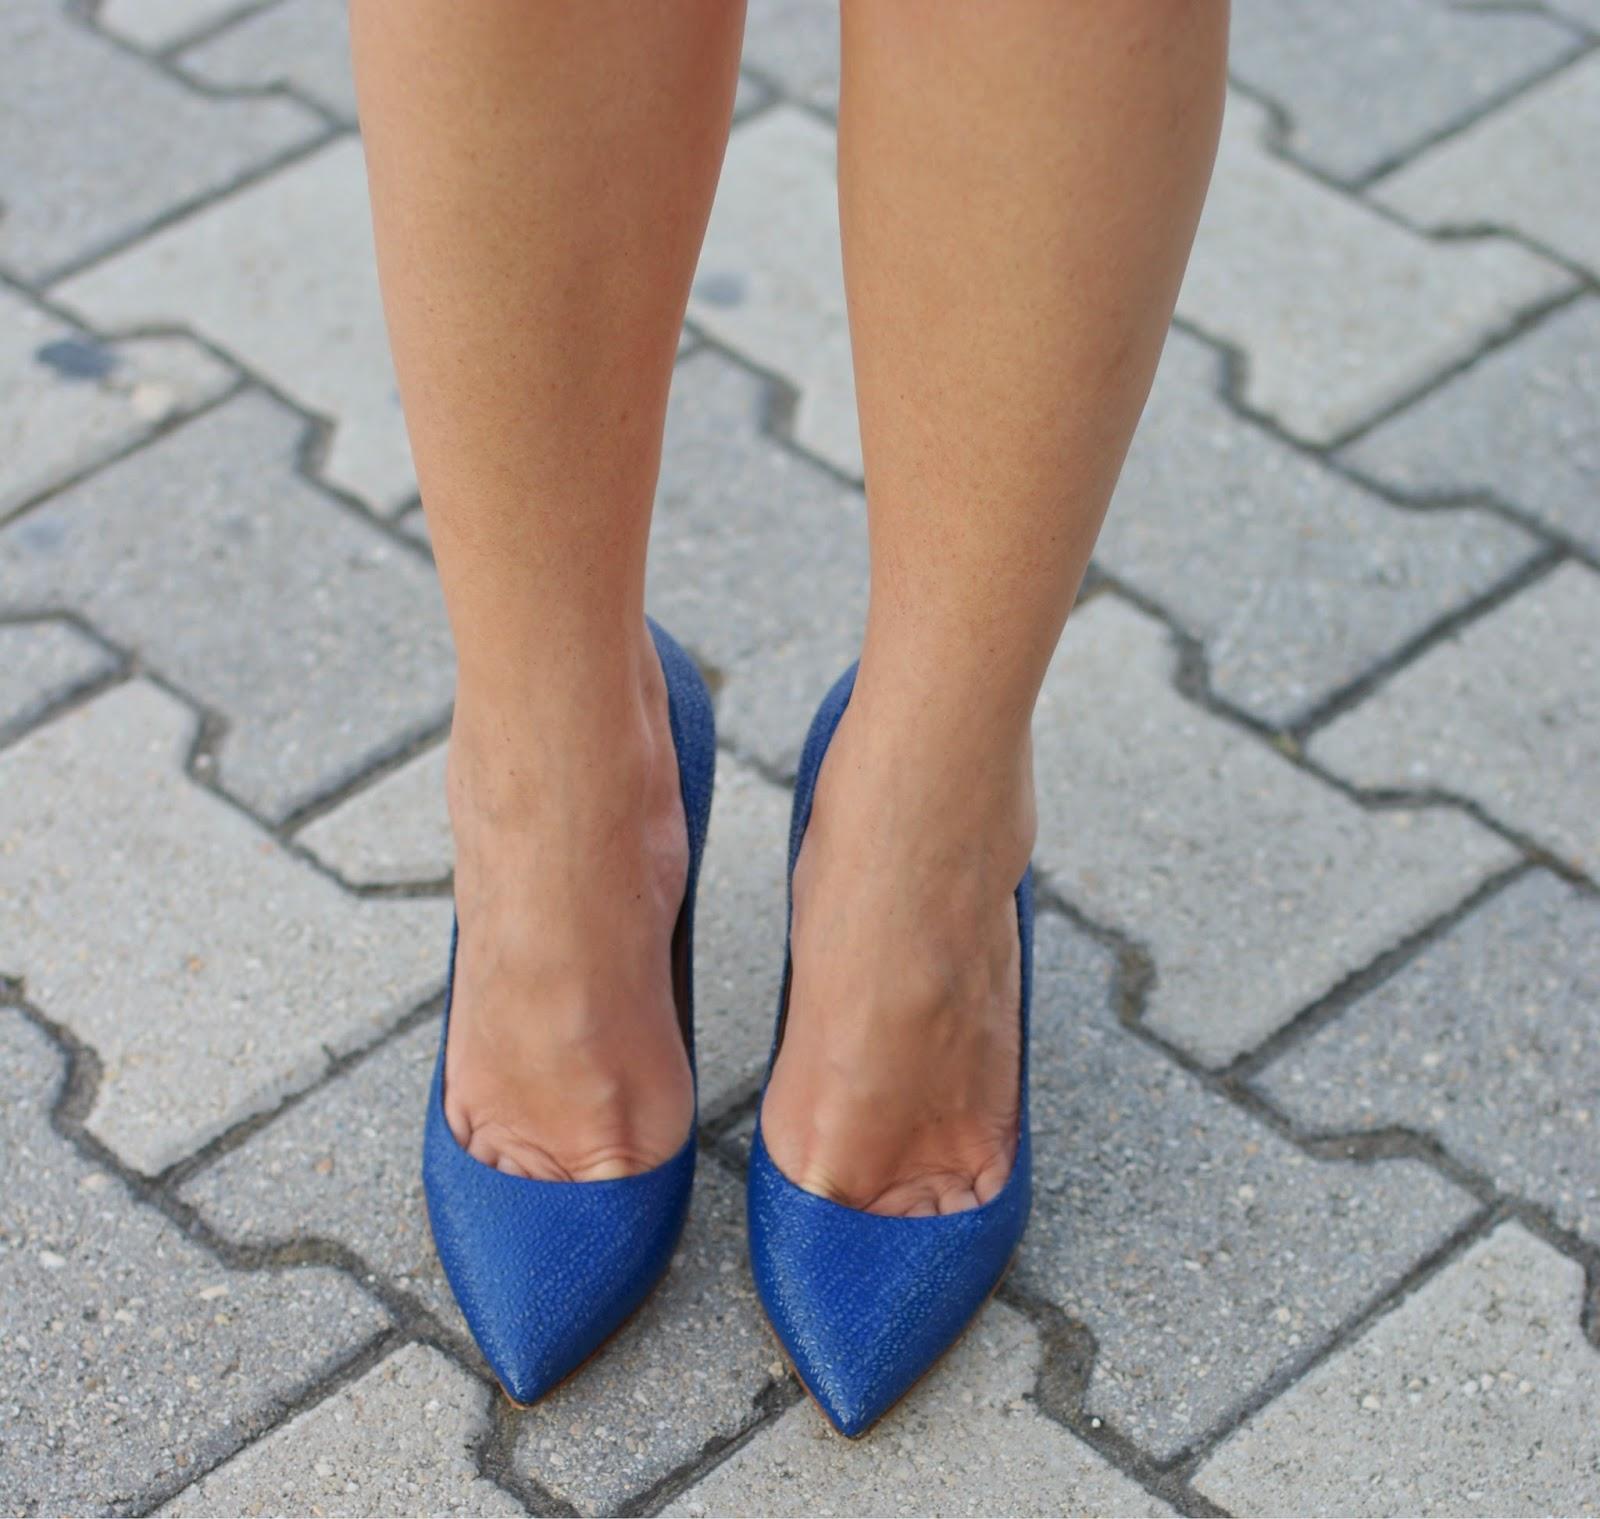 Sergio Levantesi shoes, blue pumps, Fashion and Cookies, fashion blogger